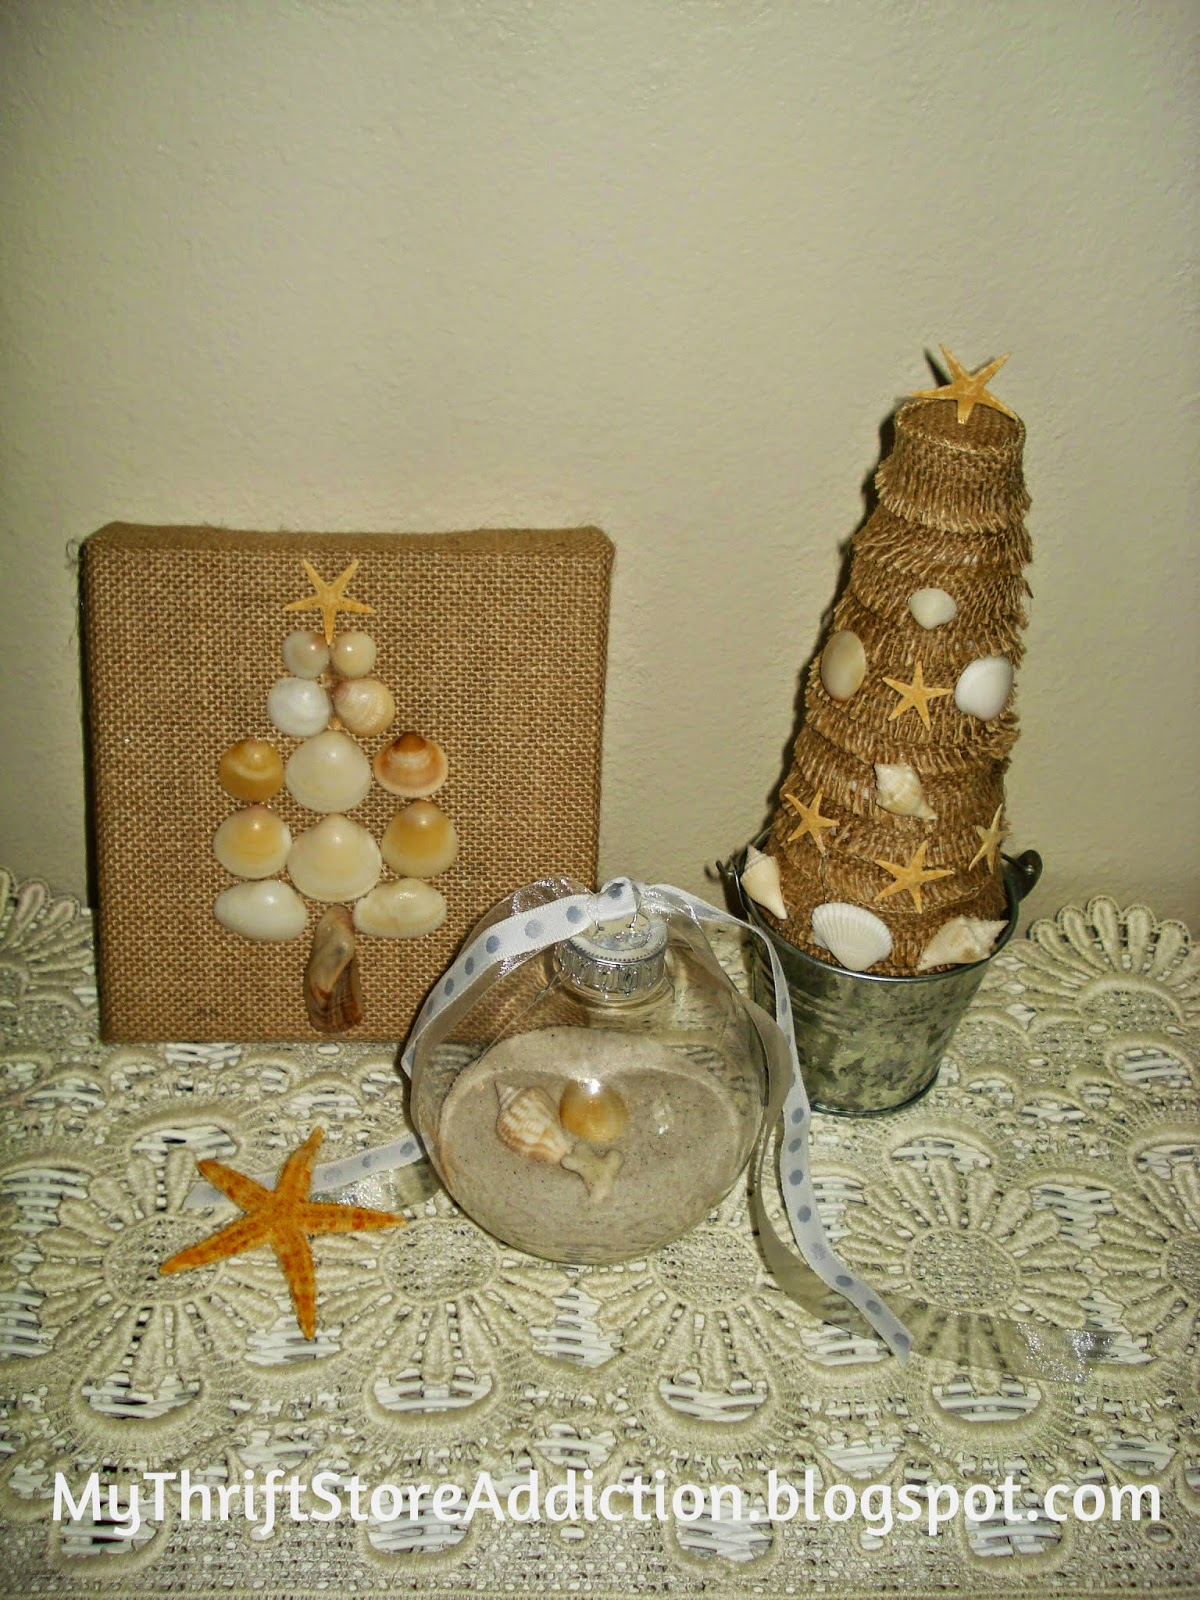 Beachy Christmas crafts